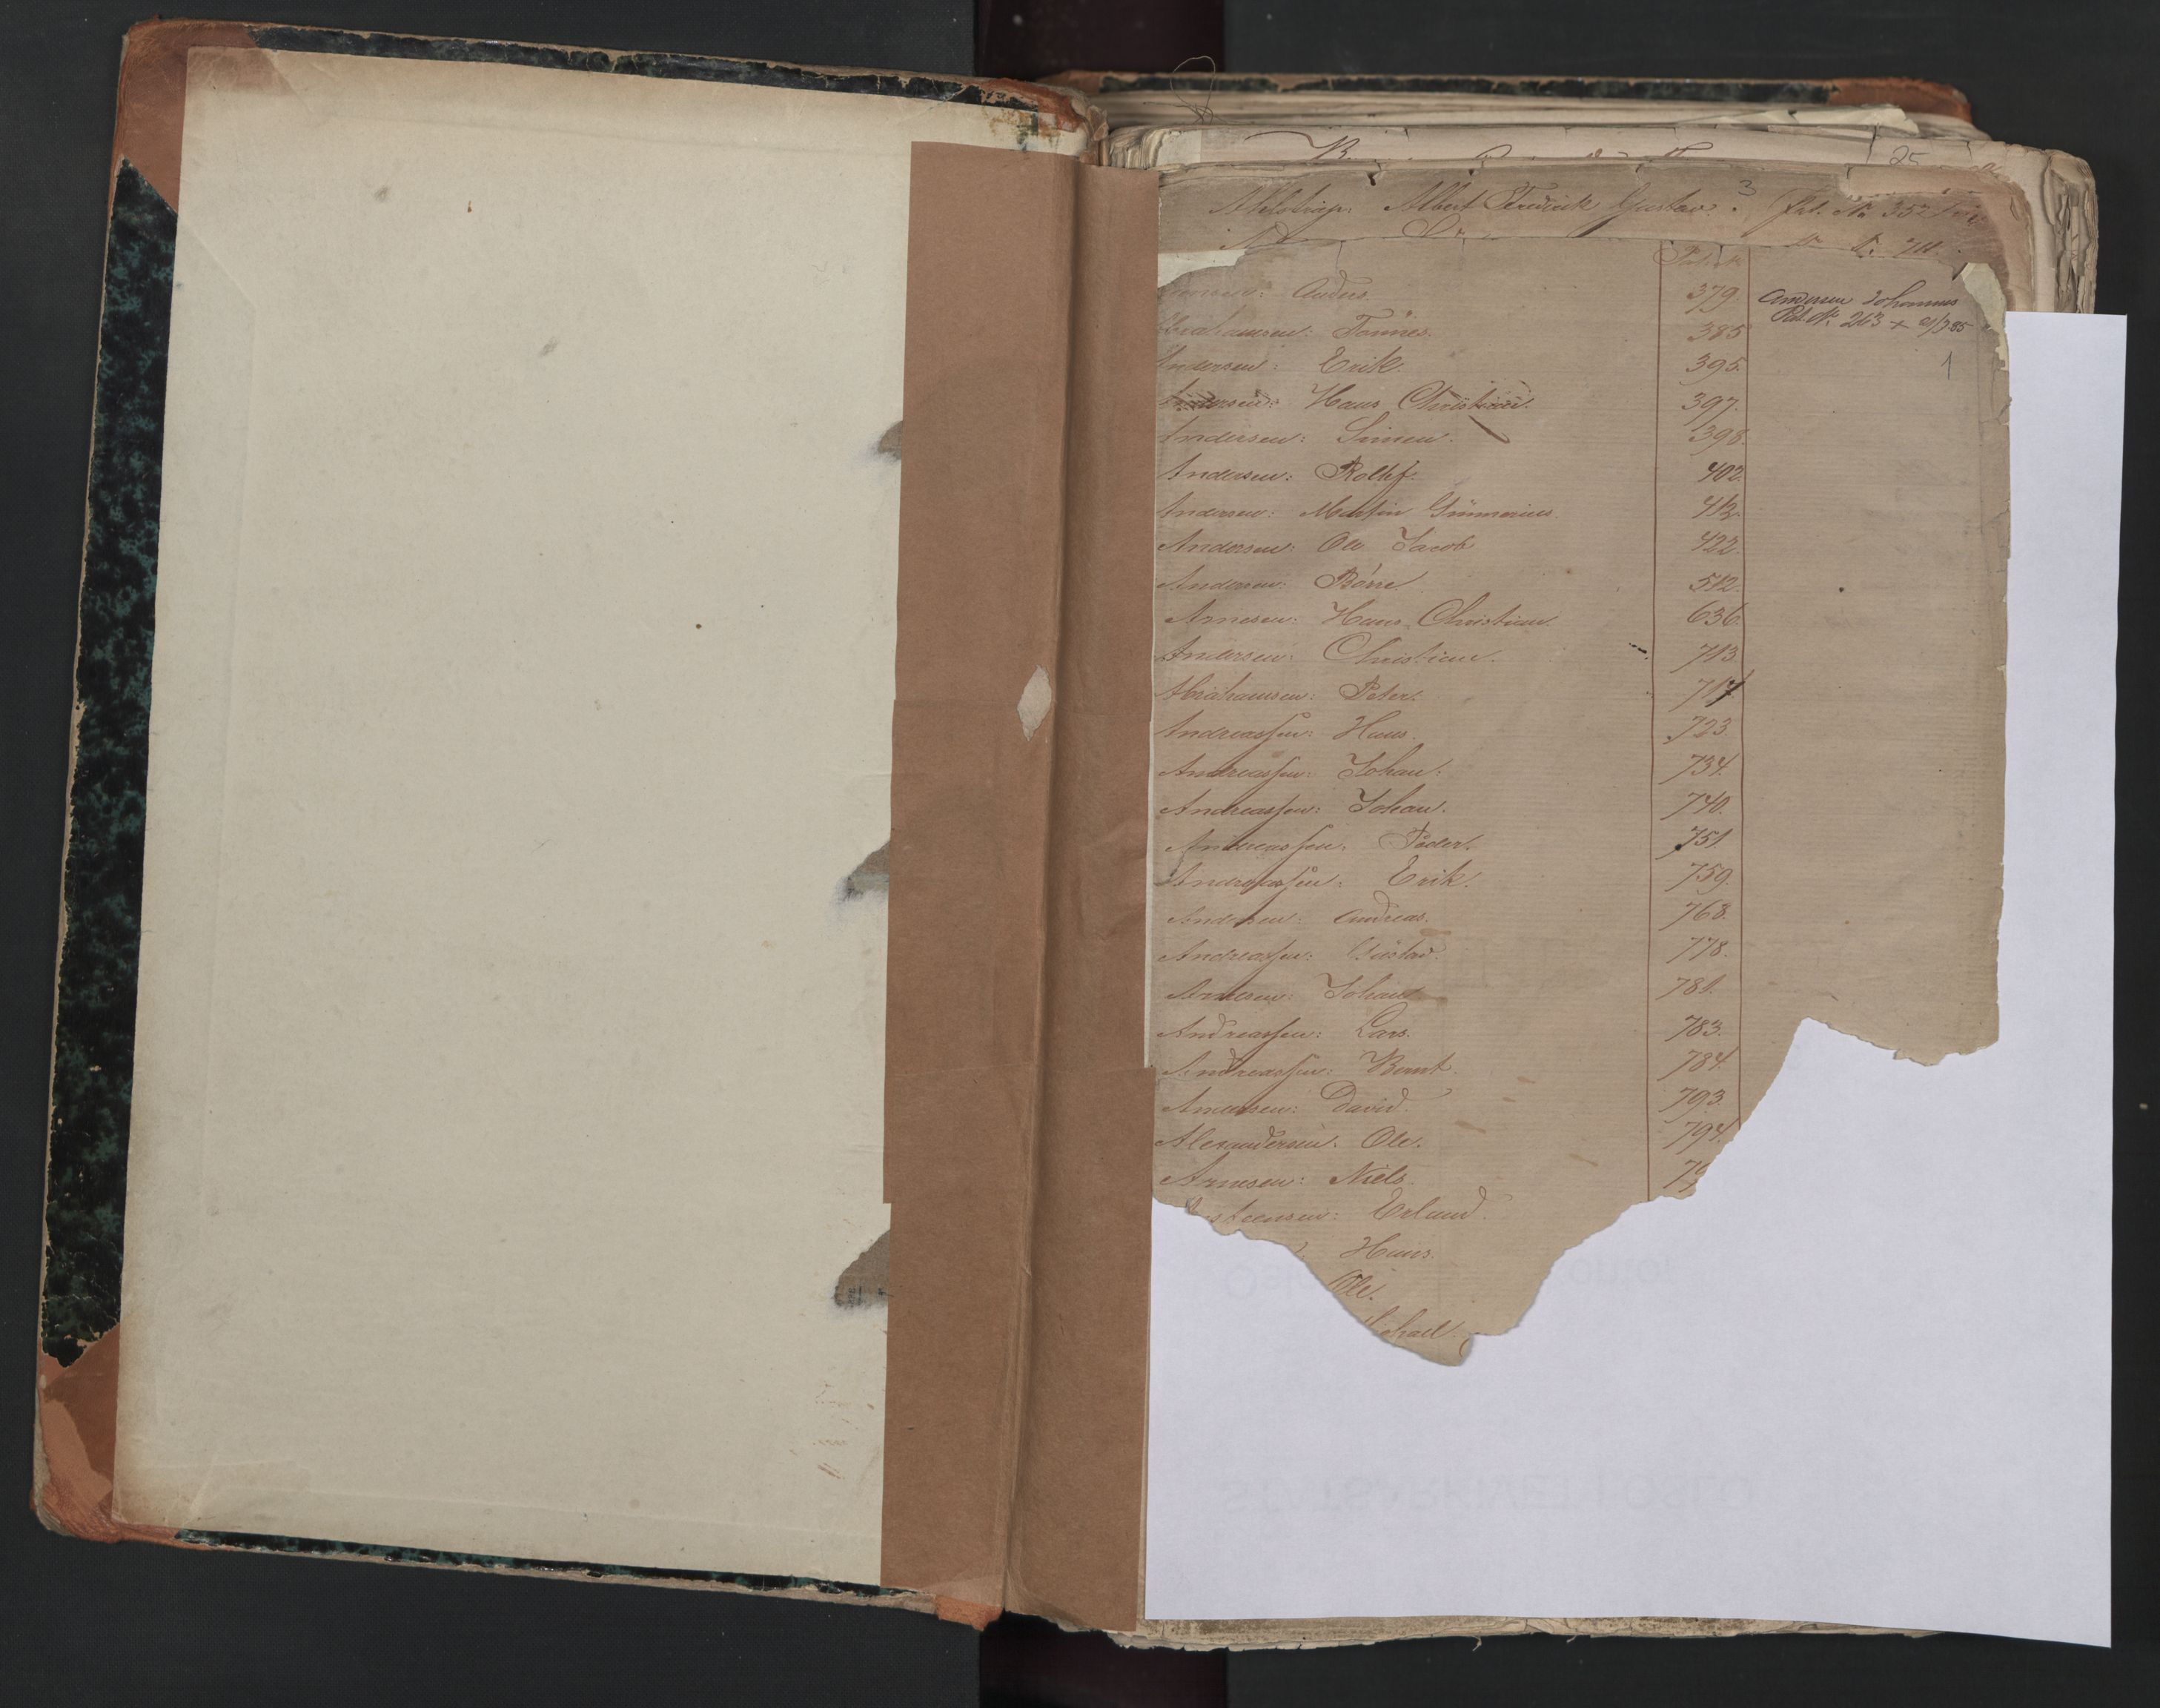 SAO, Oslo sjømannskontor, F/Fa/L0001: Register for Kristiania krets, 1866-1891, s. 1